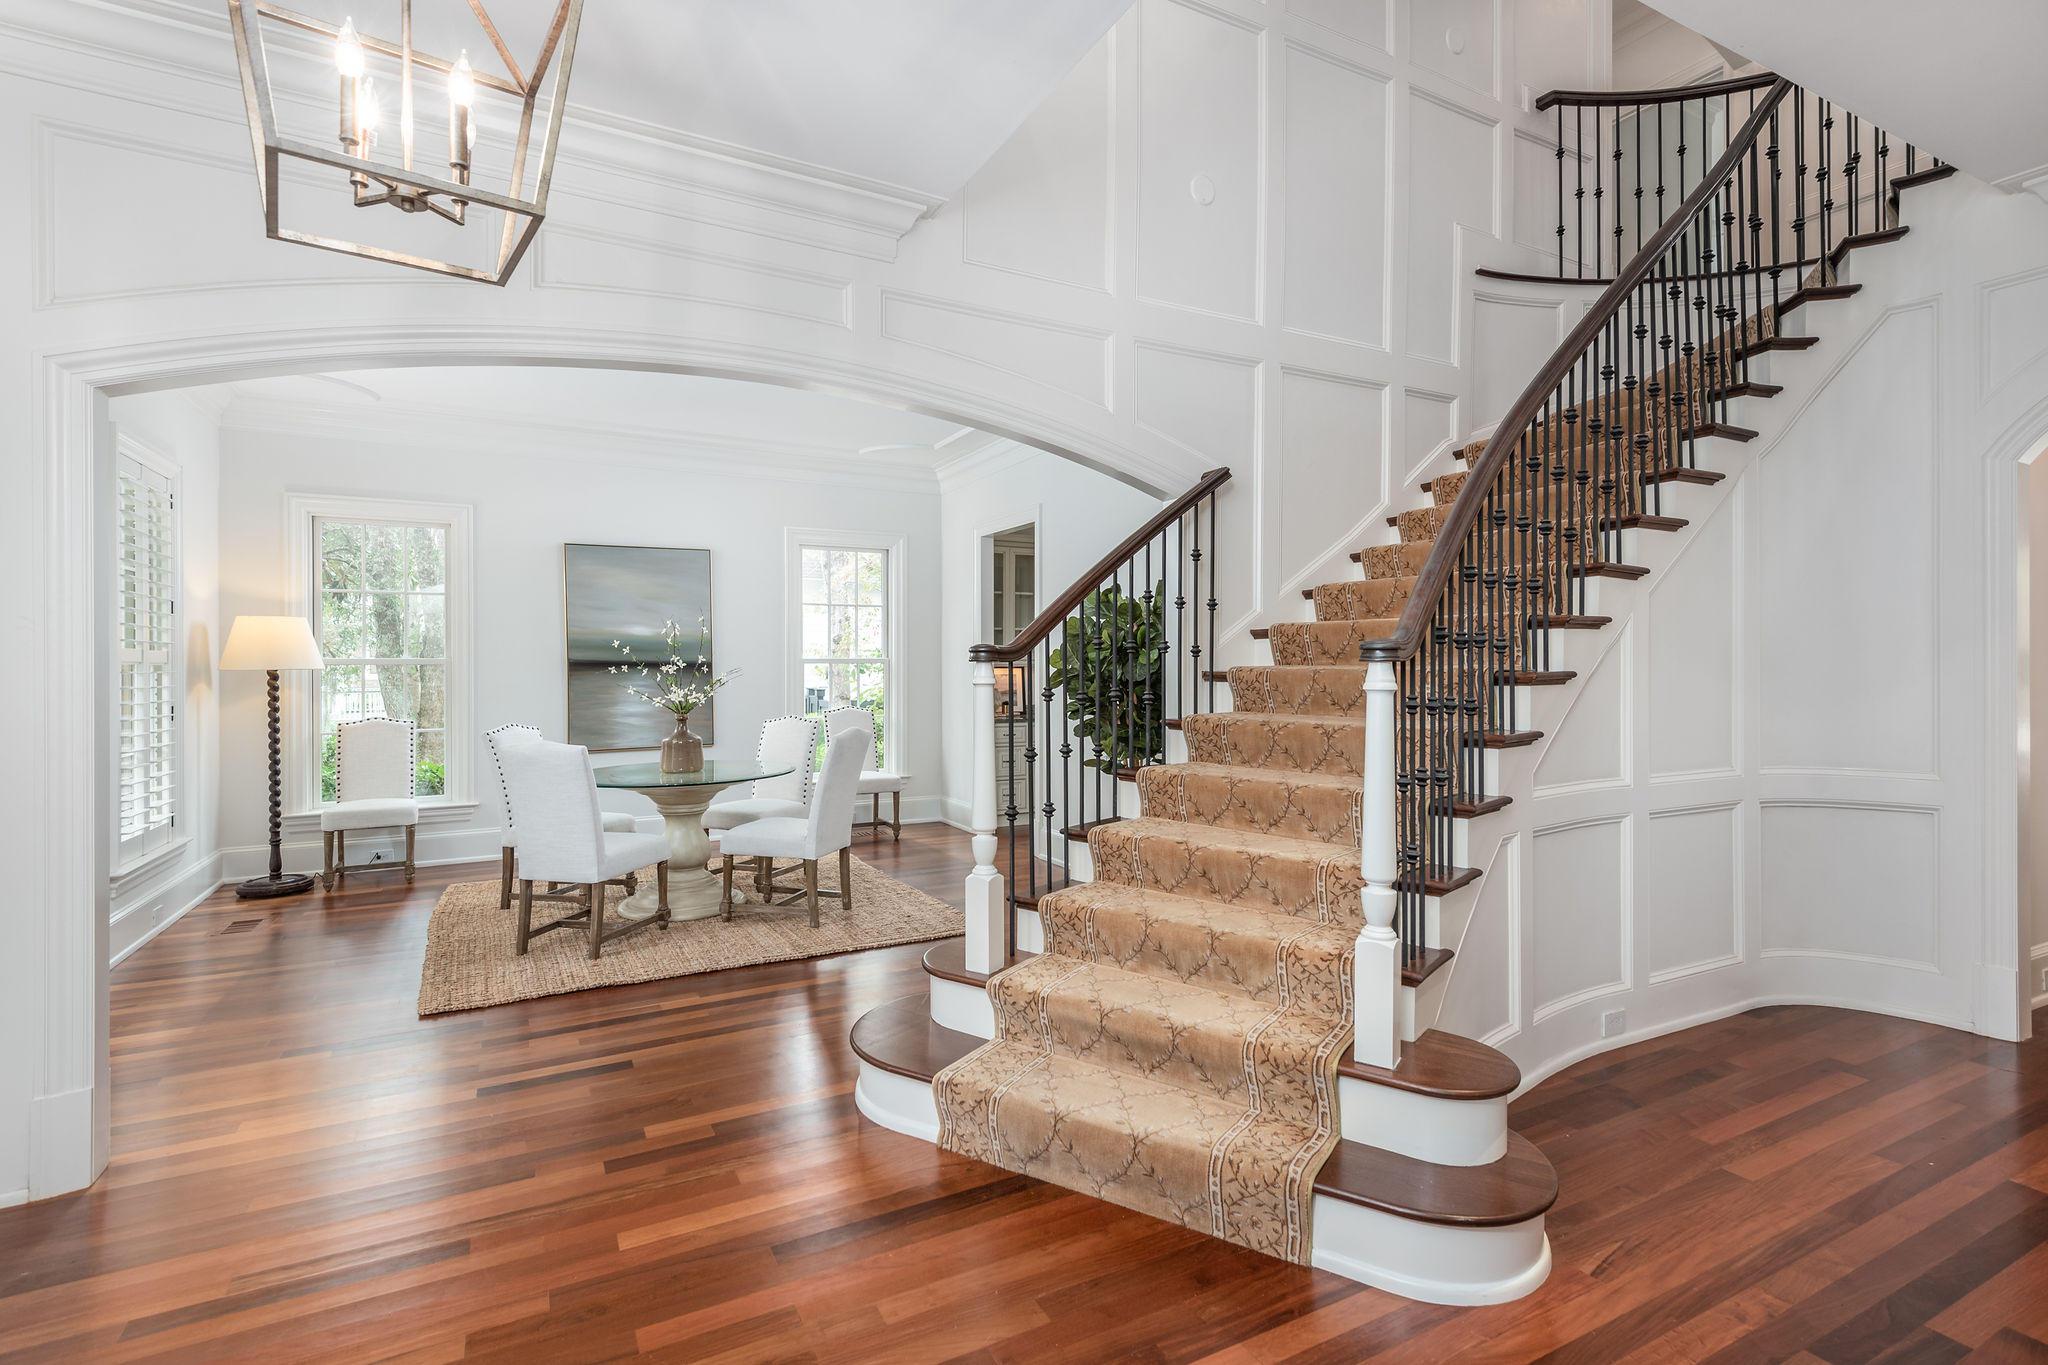 Daniel Island Park Homes For Sale - 312 Hidden Bottom, Charleston, SC - 28